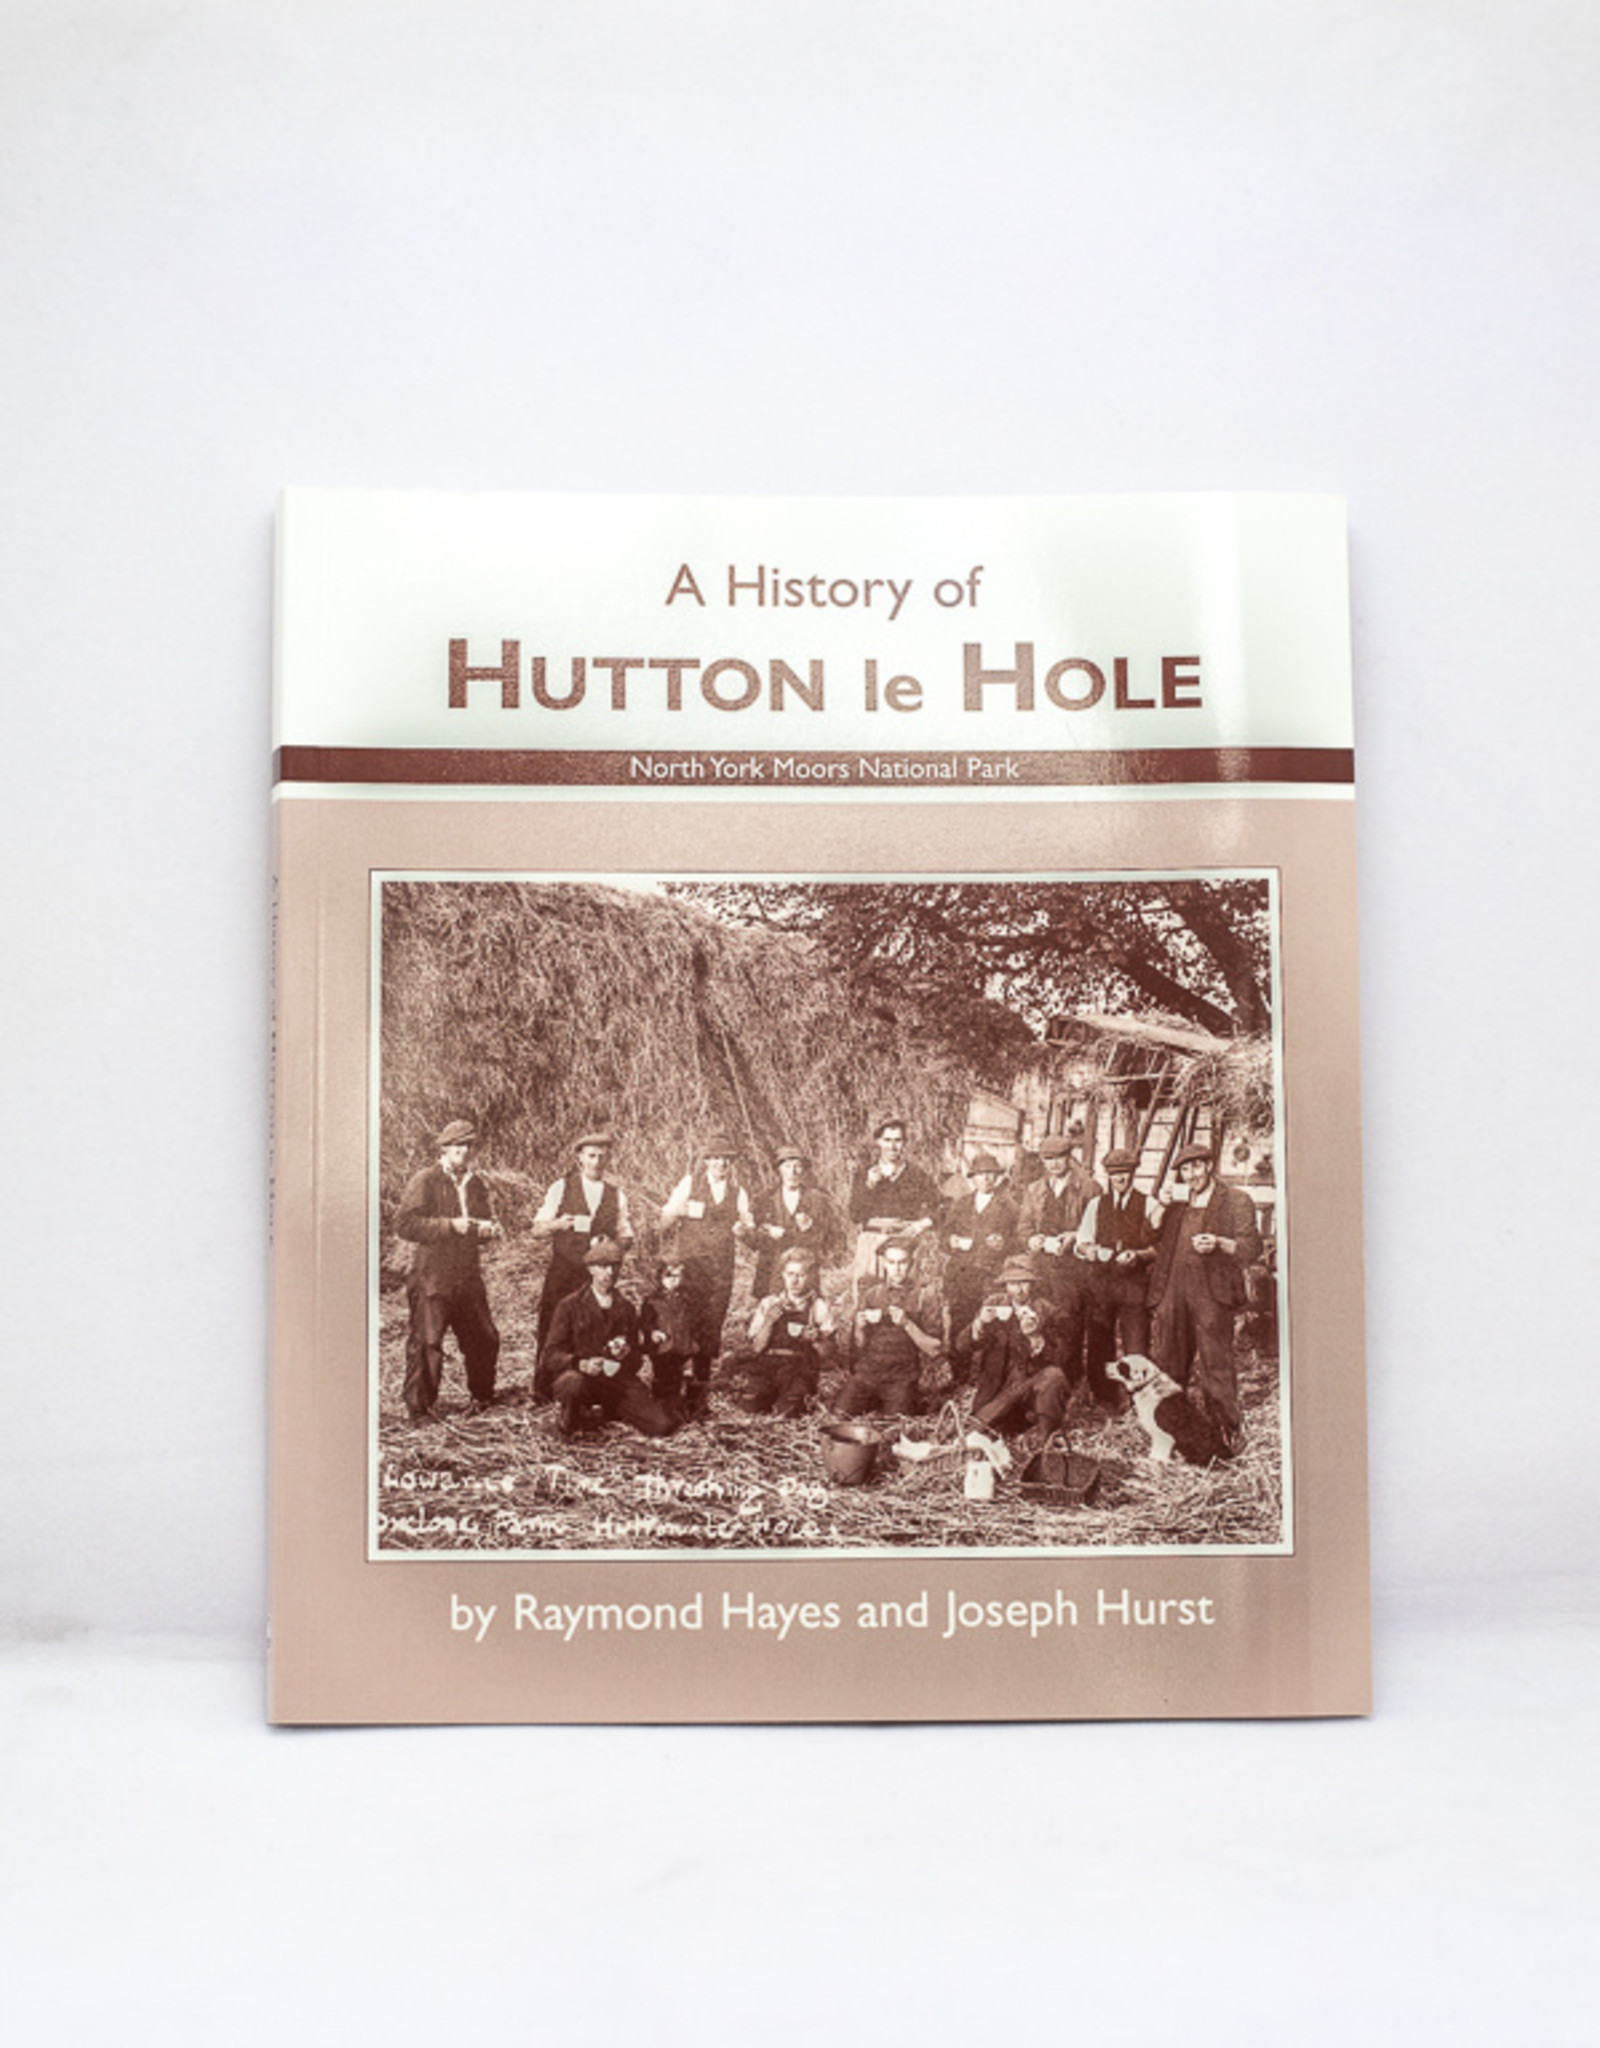 History of Hutton-le-Hole